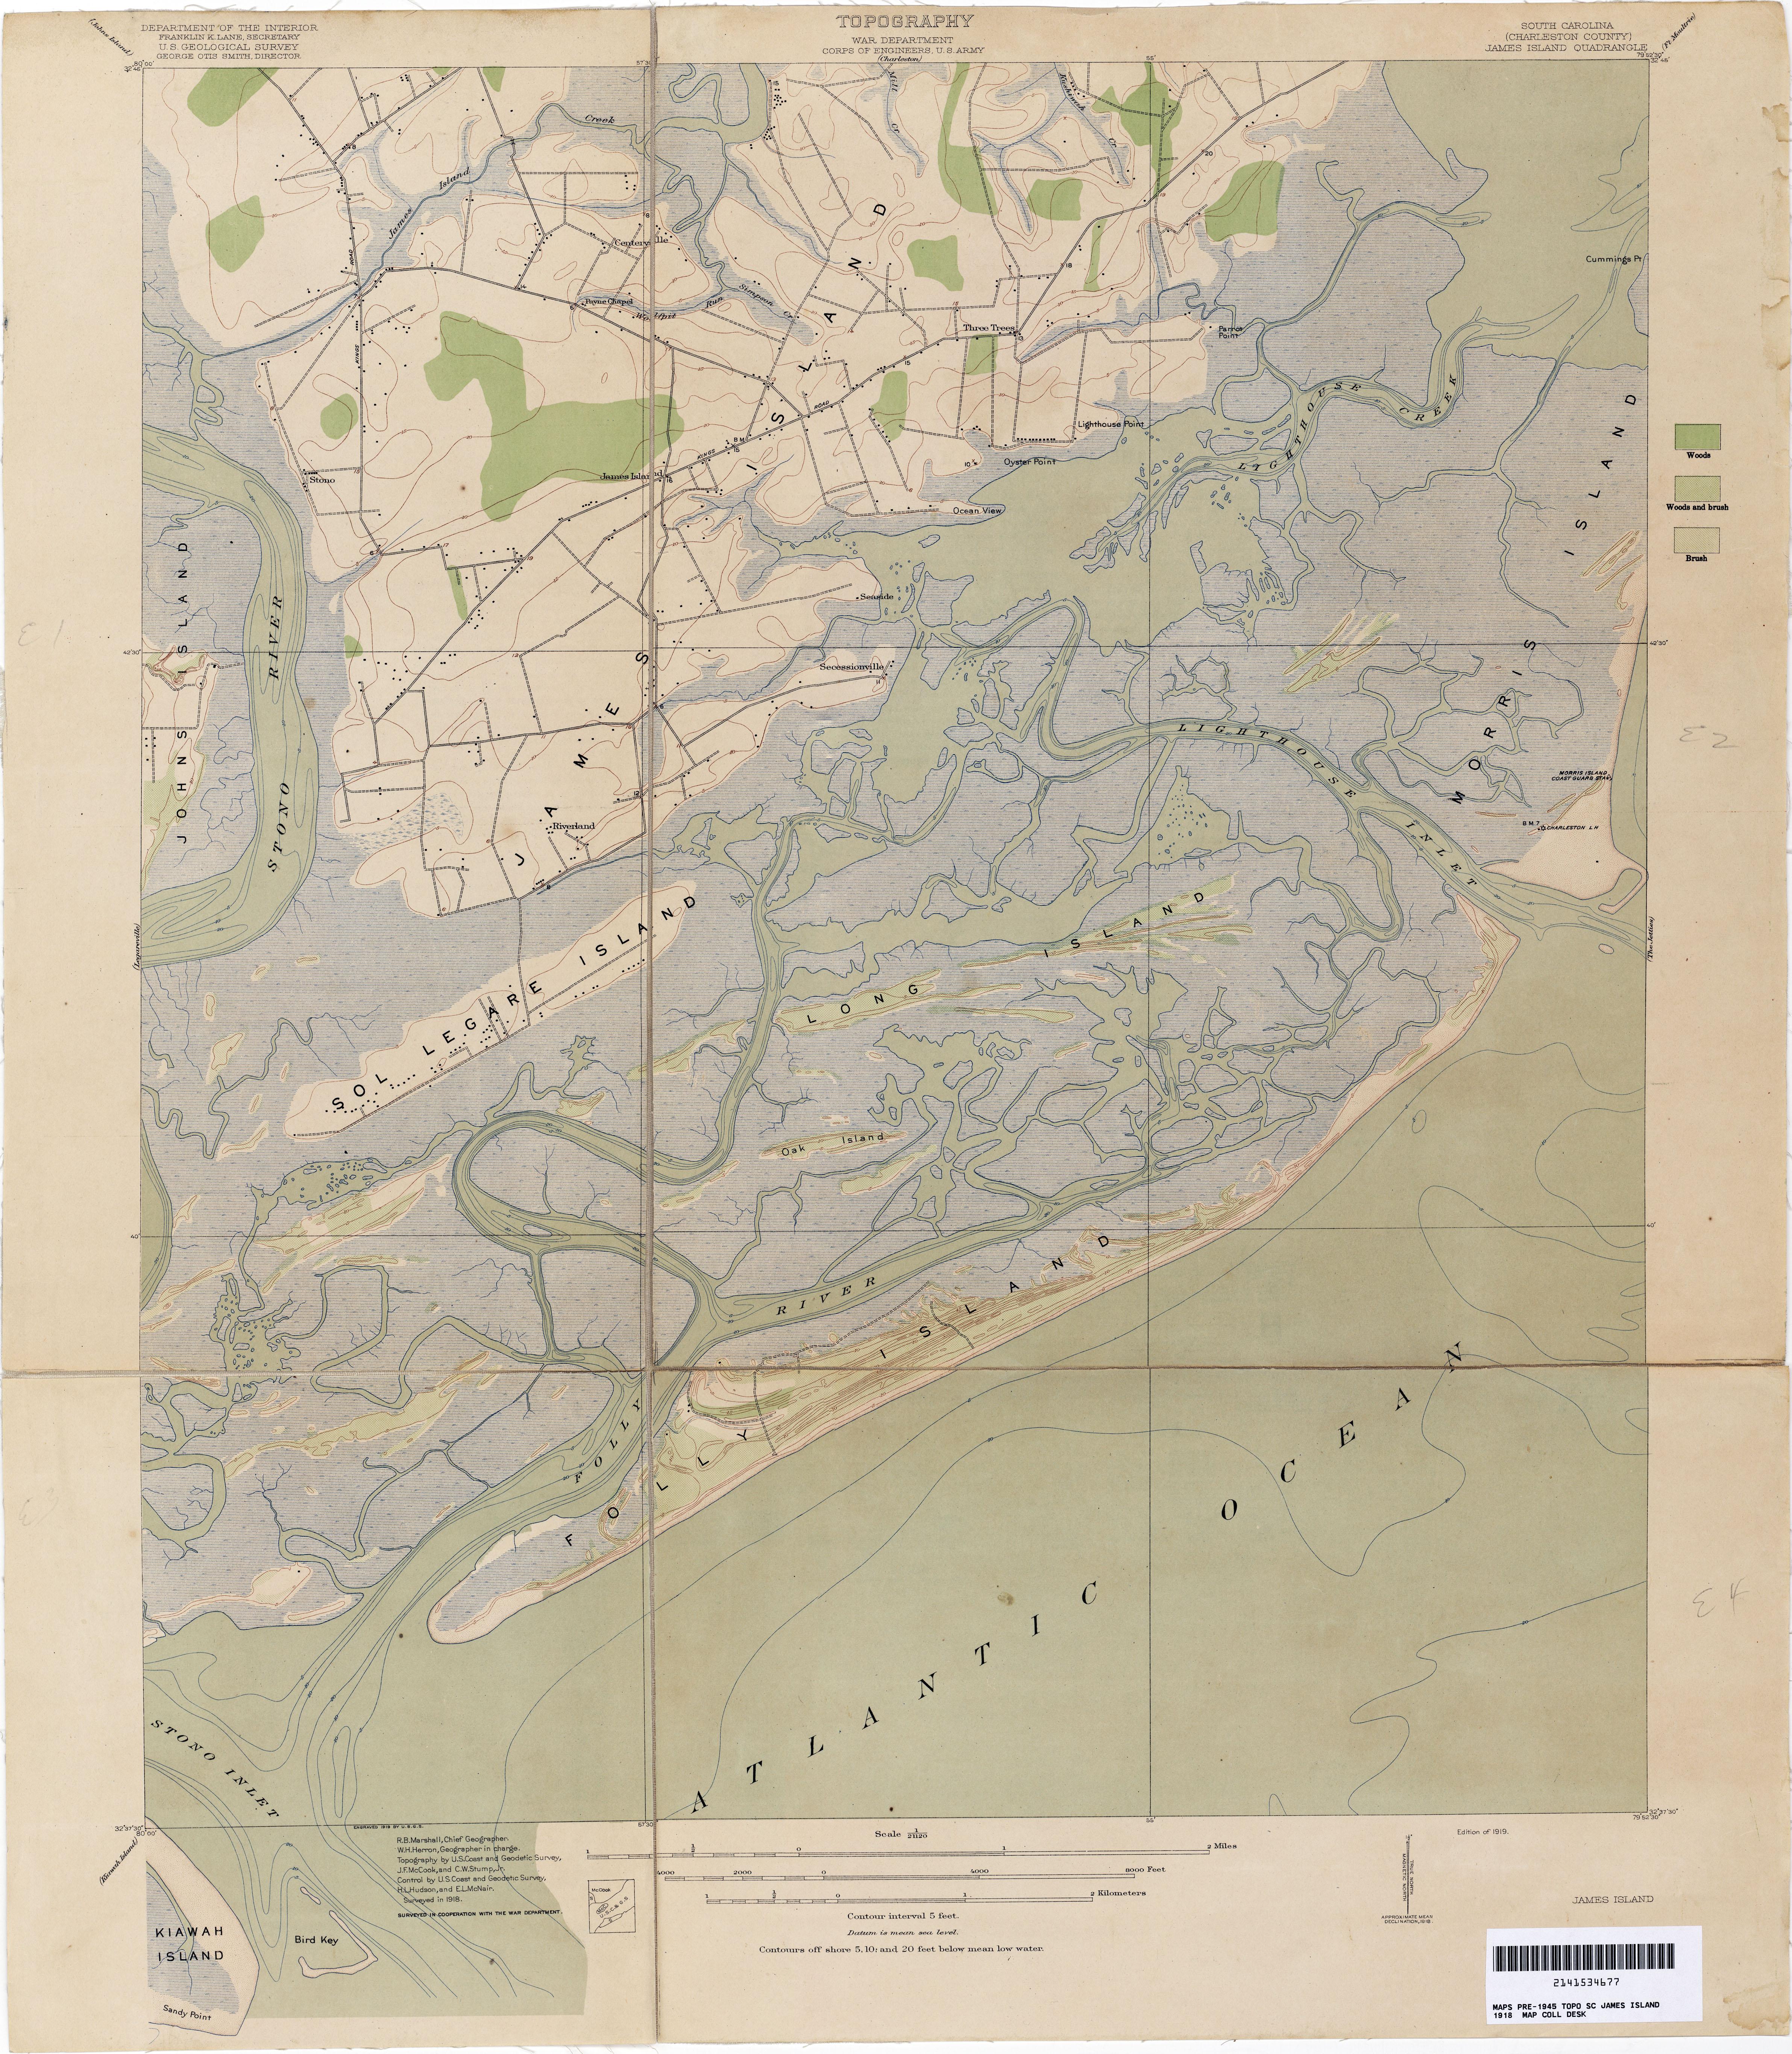 South Carolina Map Islands.South Carolina Historical Topographic Maps Perry Castaneda Map